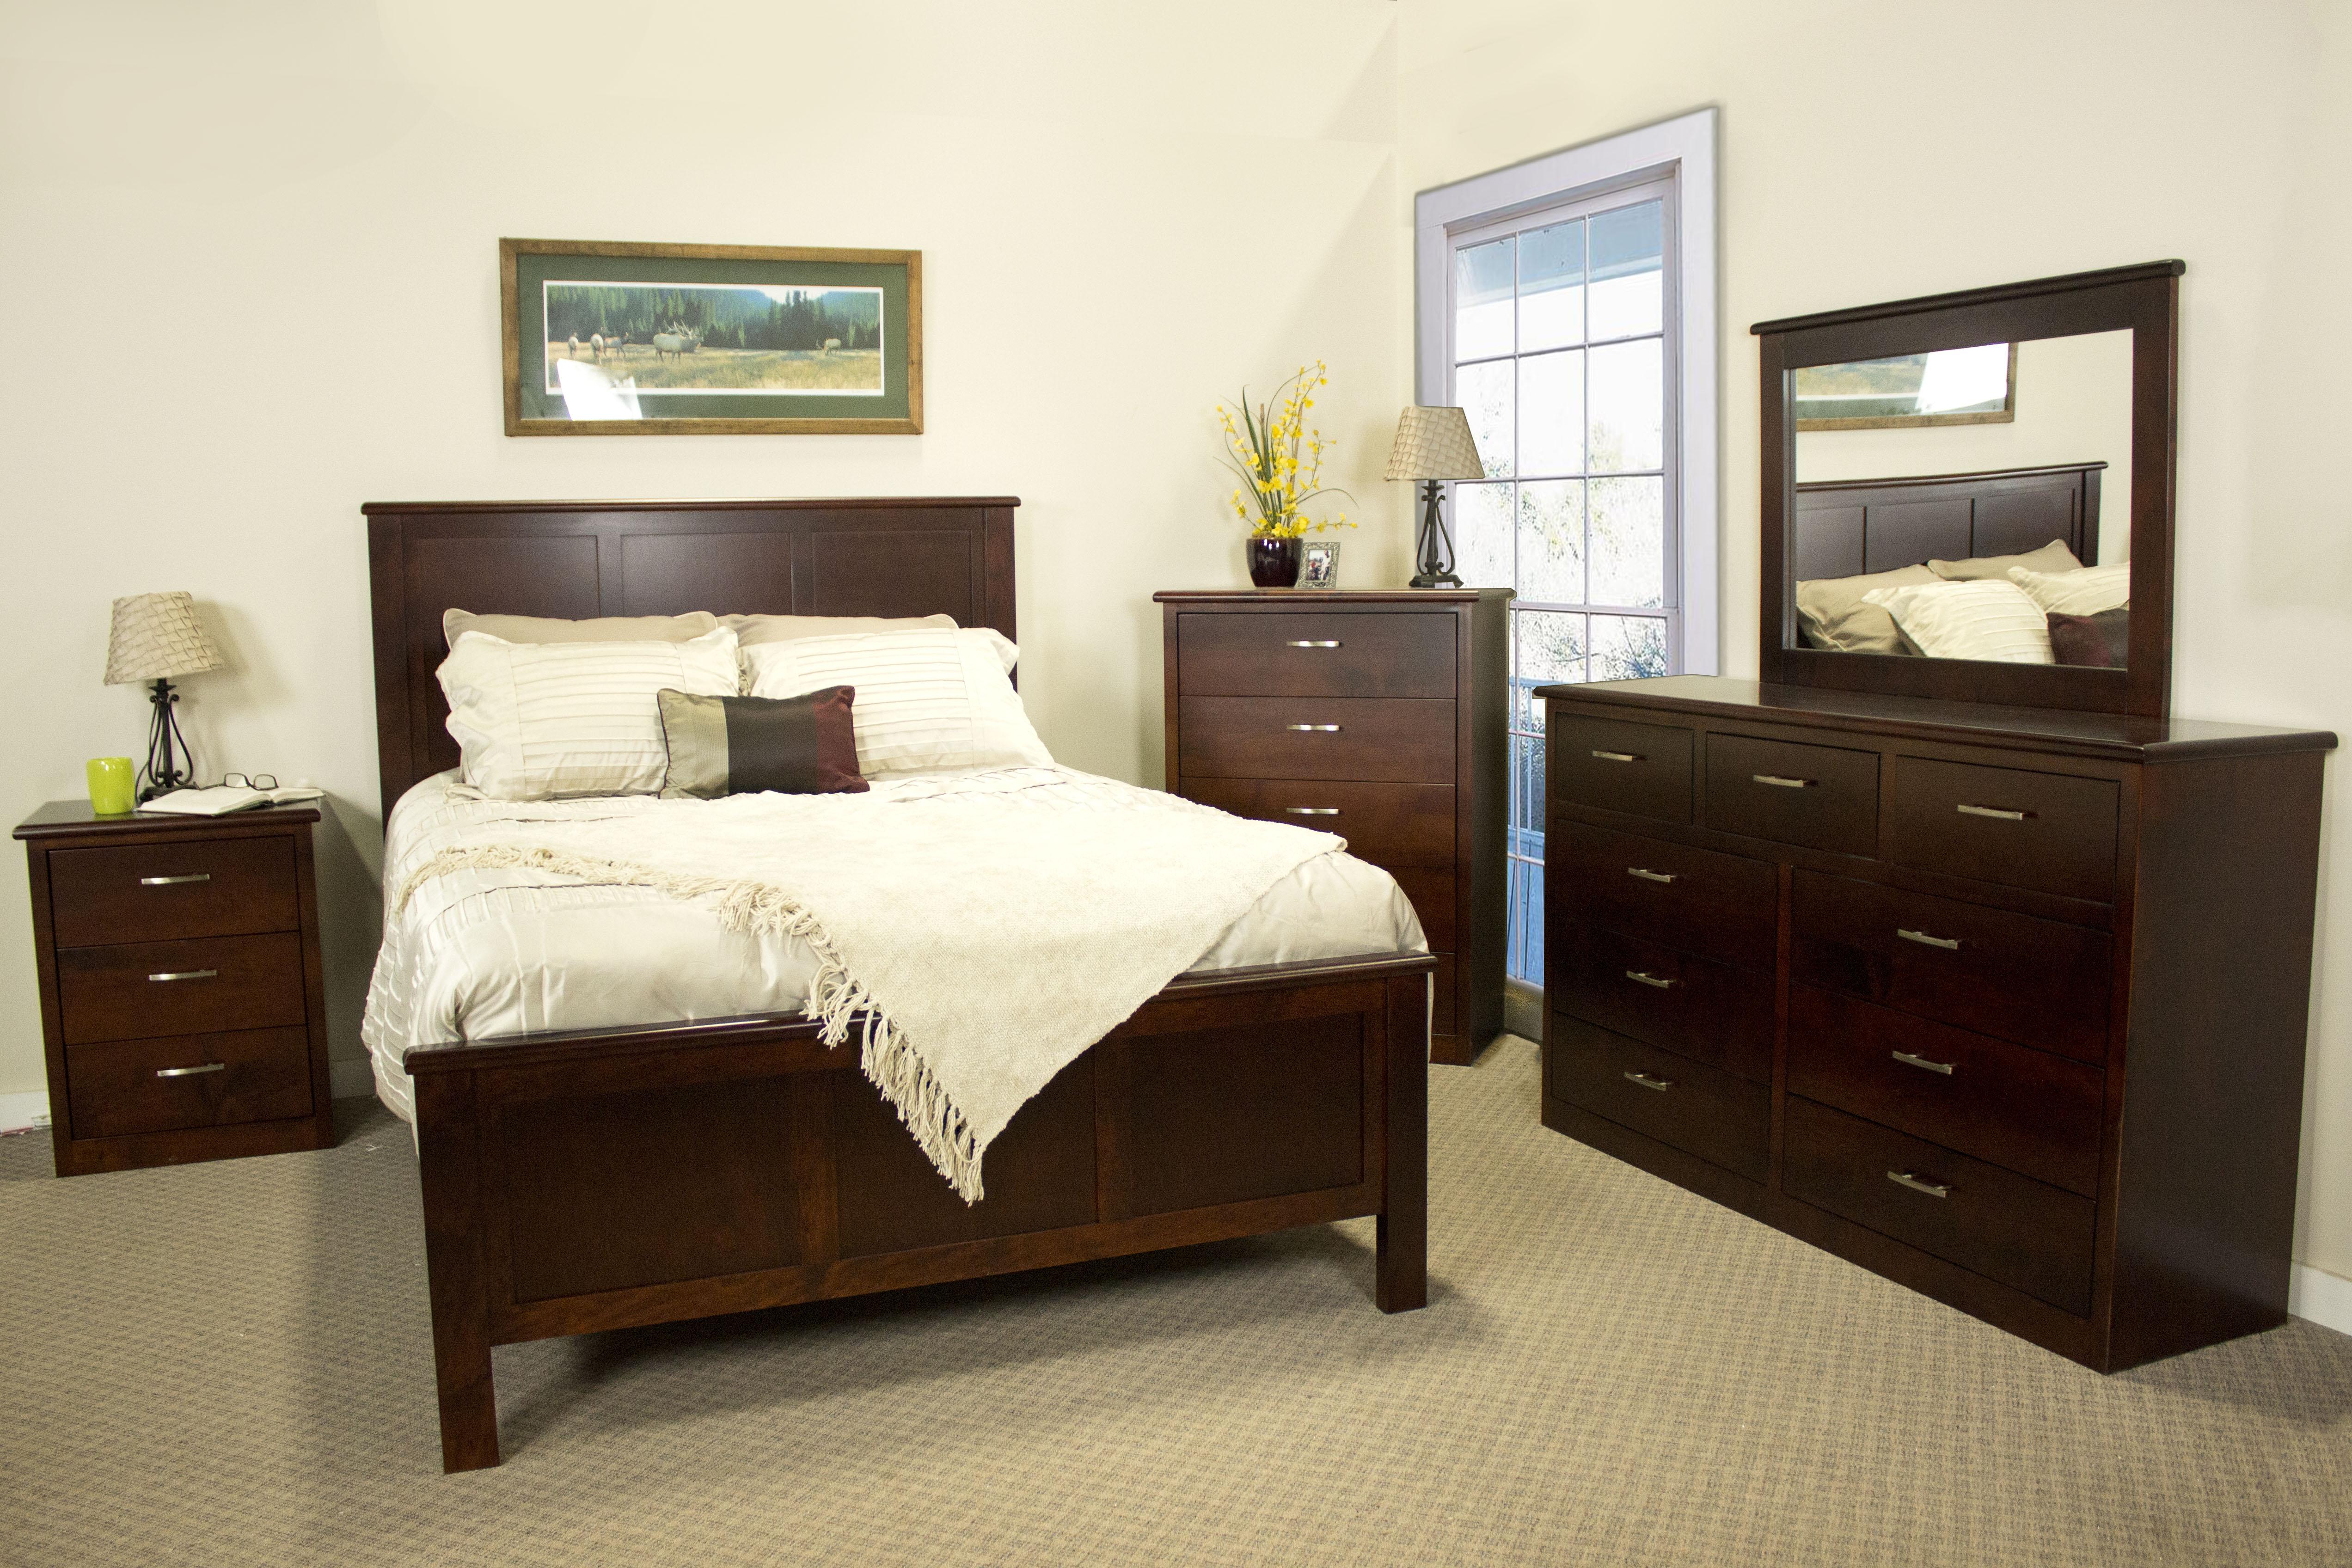 Monticello Bedroom Furniture Urban Collection Bedroom Furniture Modroxcom